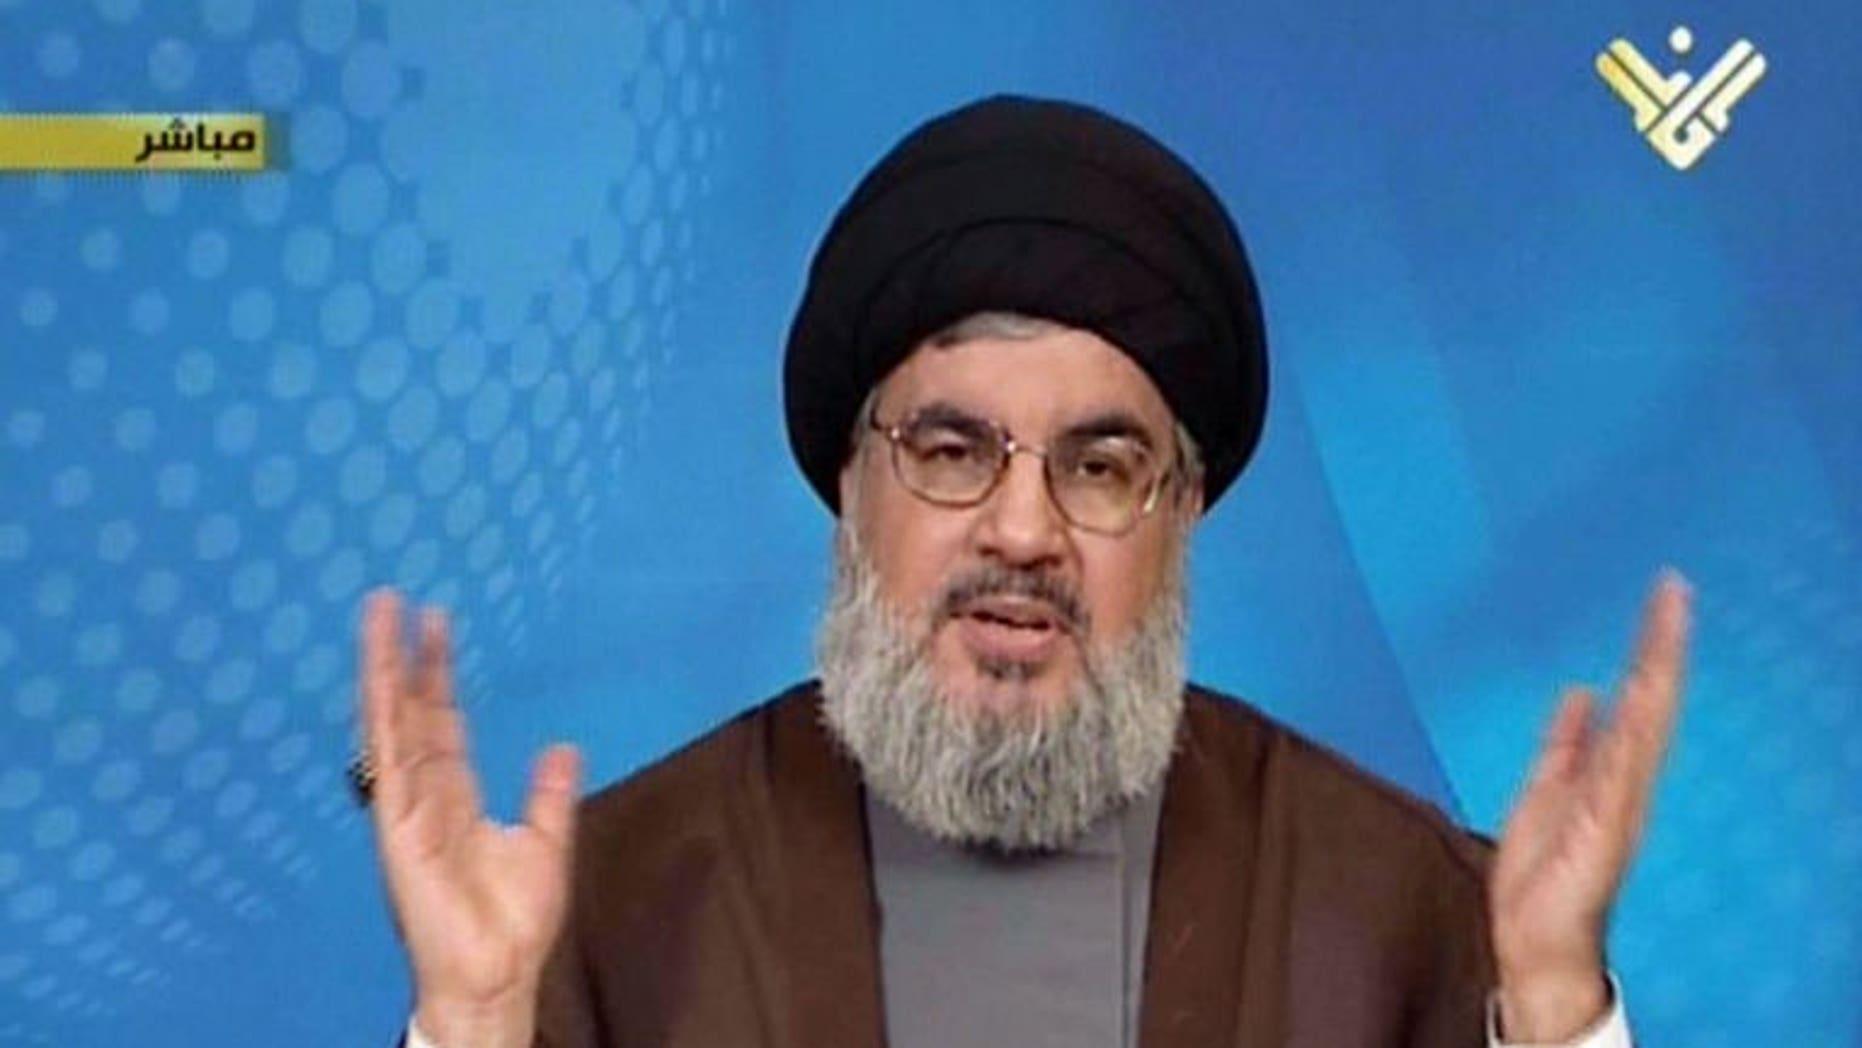 An image grab from Hezbollah's al-Manar TV shows Hassan Nasrallah, head of Hezbollah, on September 23, 2013 in Lebanon.